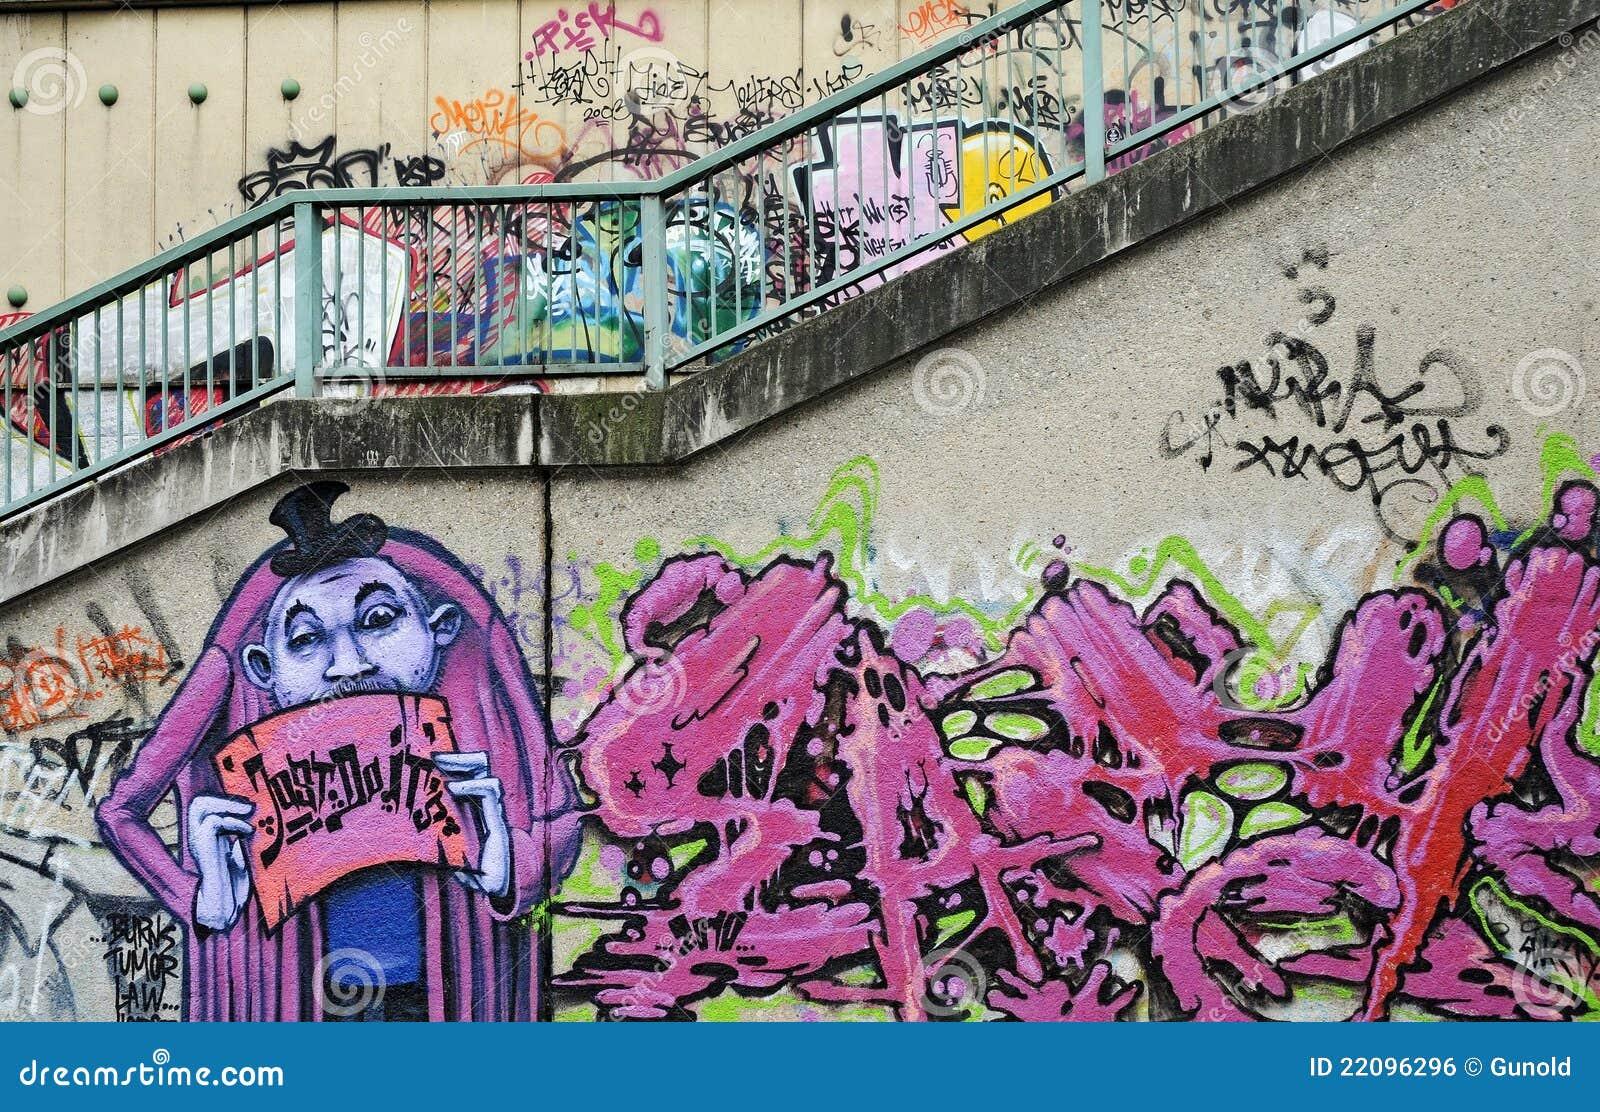 graffiti redaktionelles foto bild von lack spr her 22096296. Black Bedroom Furniture Sets. Home Design Ideas